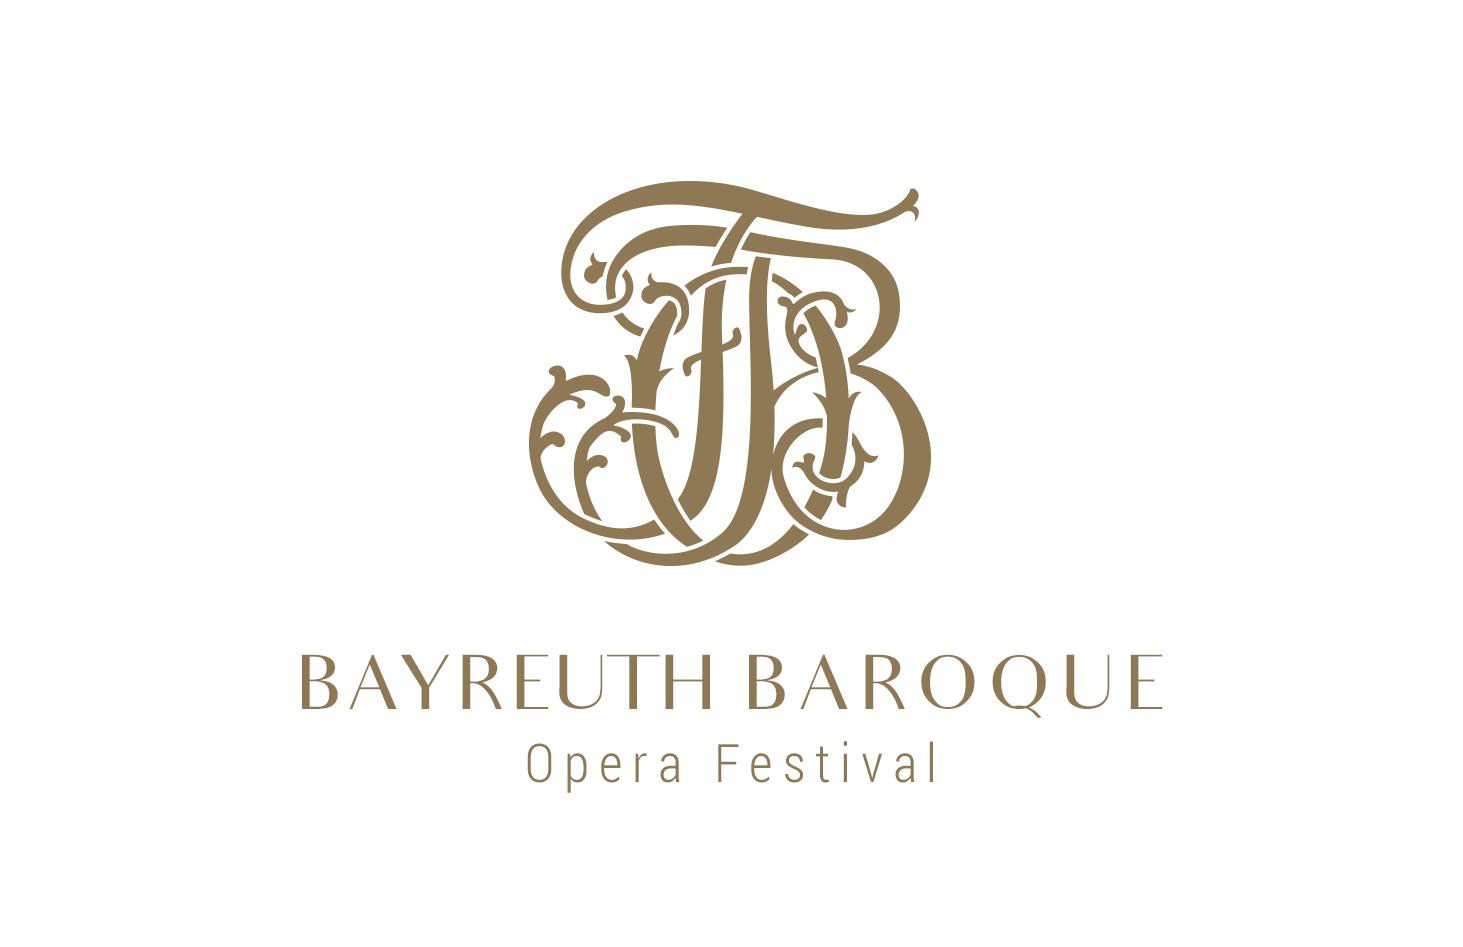 Kilmulis design - Bayreuth Baroque Opera Festival - logo 01